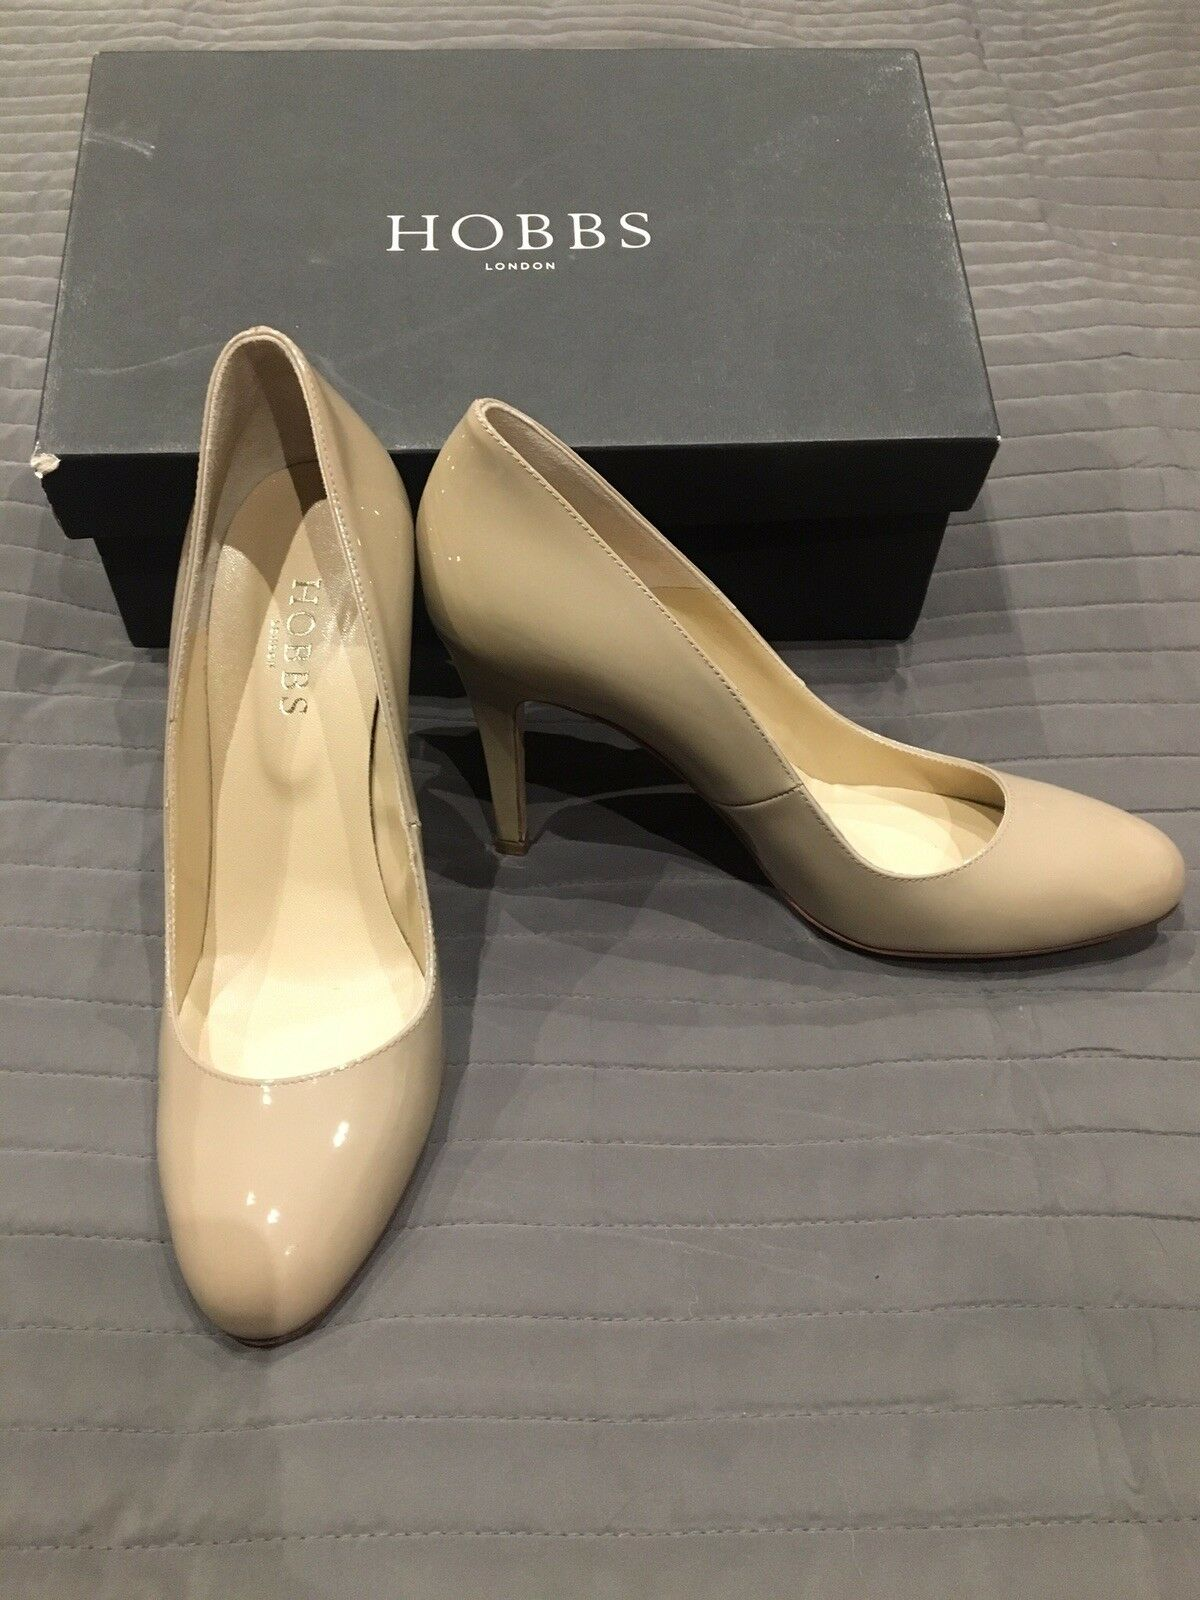 Hobbs Nude Charol Charol Charol Rebecca Court zapatos. Talla 39.5. usado una vez. 975a86